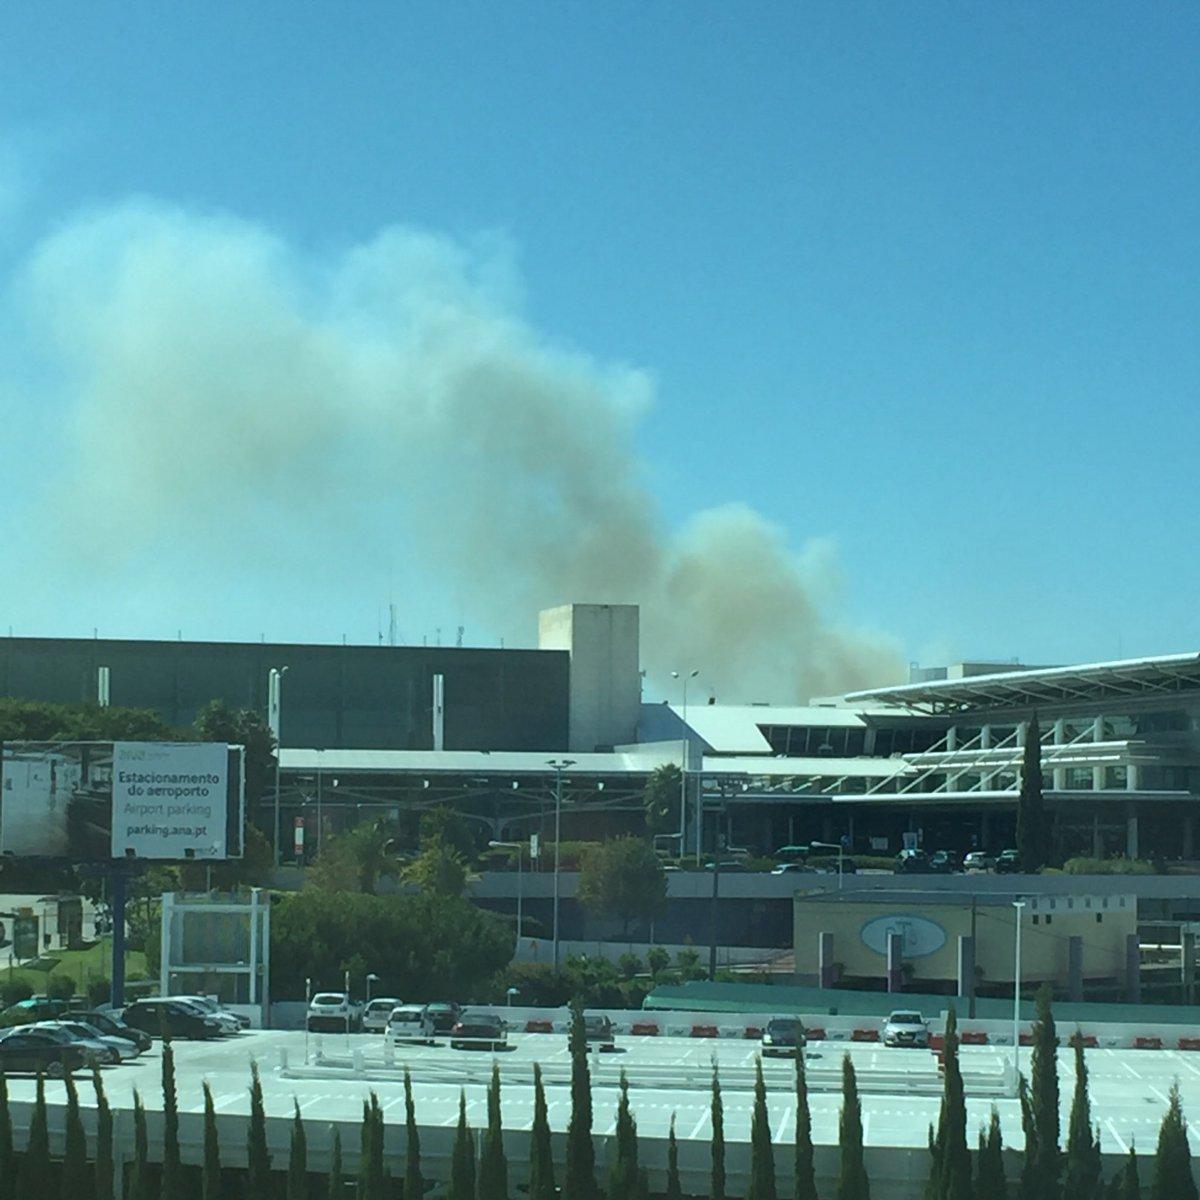 Aeroporto de Lisboa. Será incêndio? https://t.co/w26ihSvq52